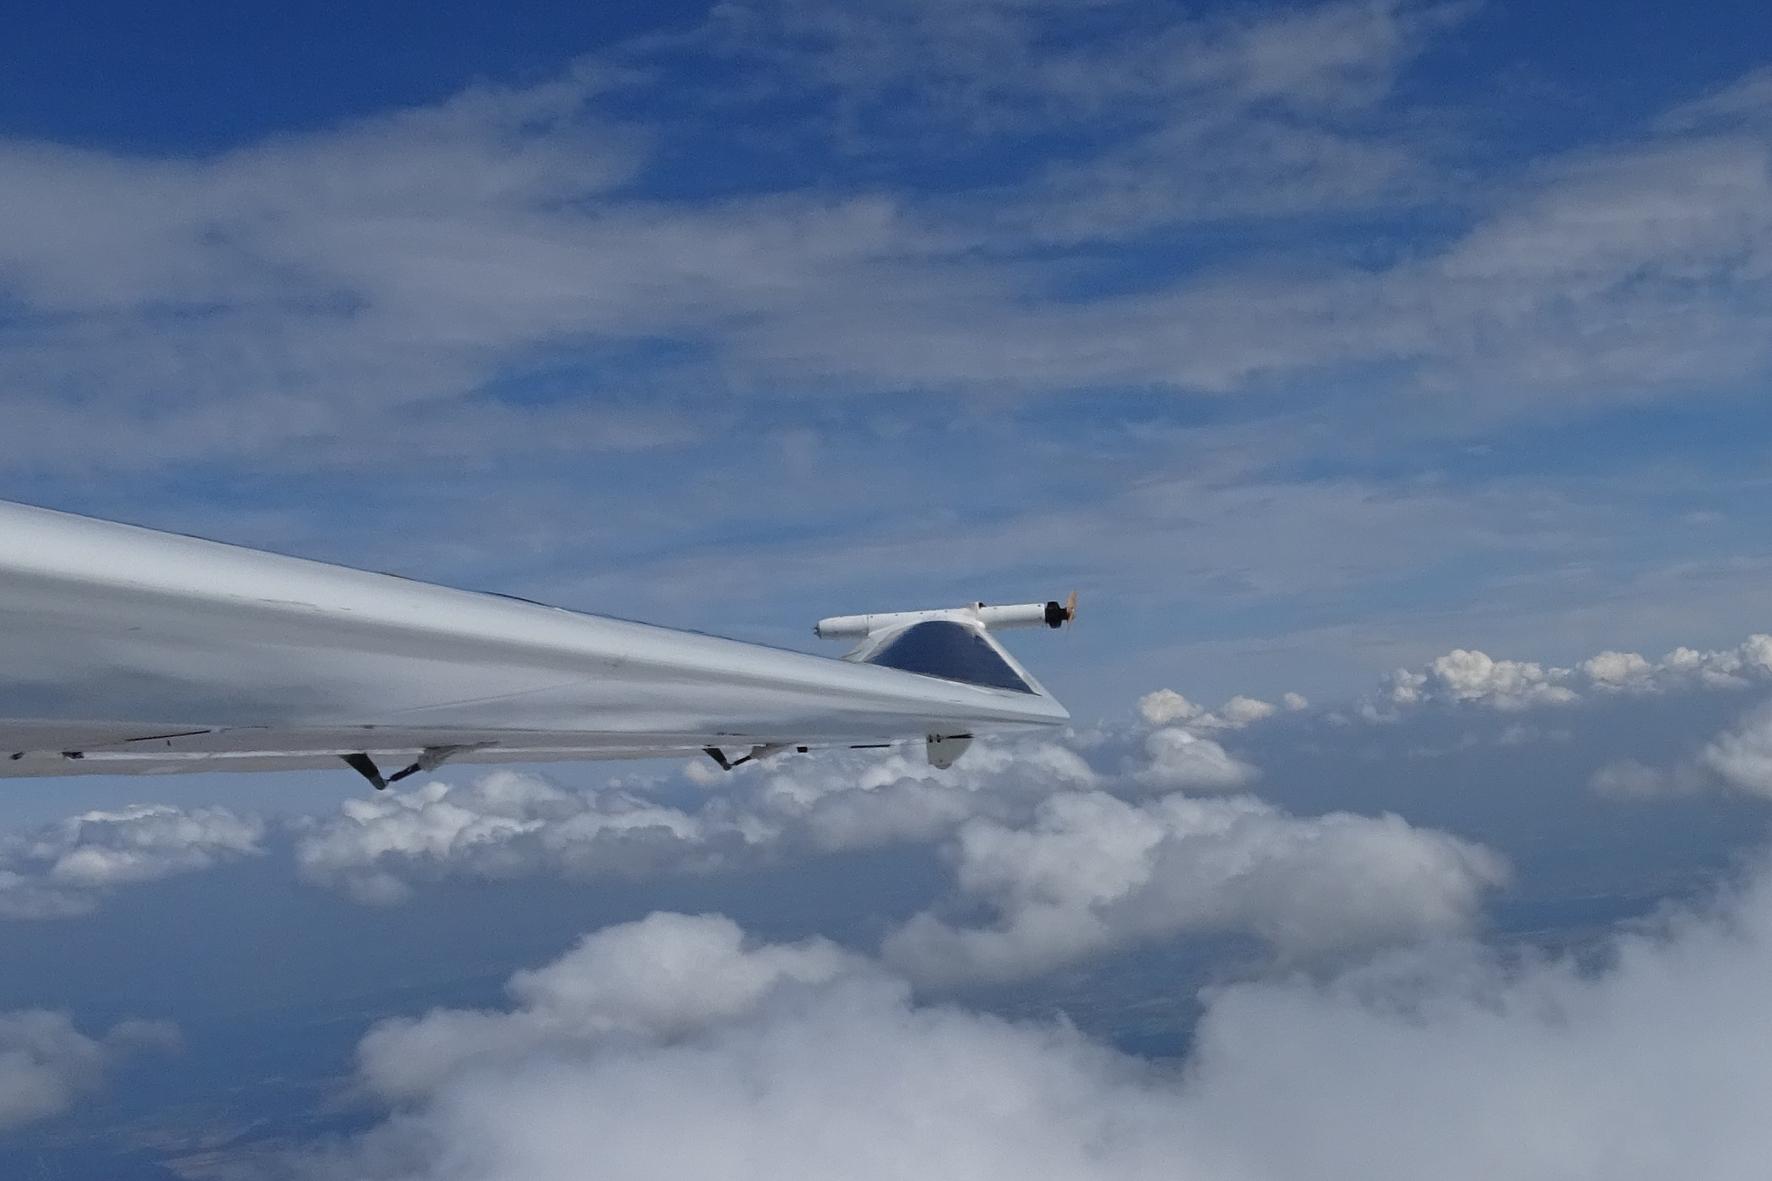 mid Groß-Gerau - Solarflieger